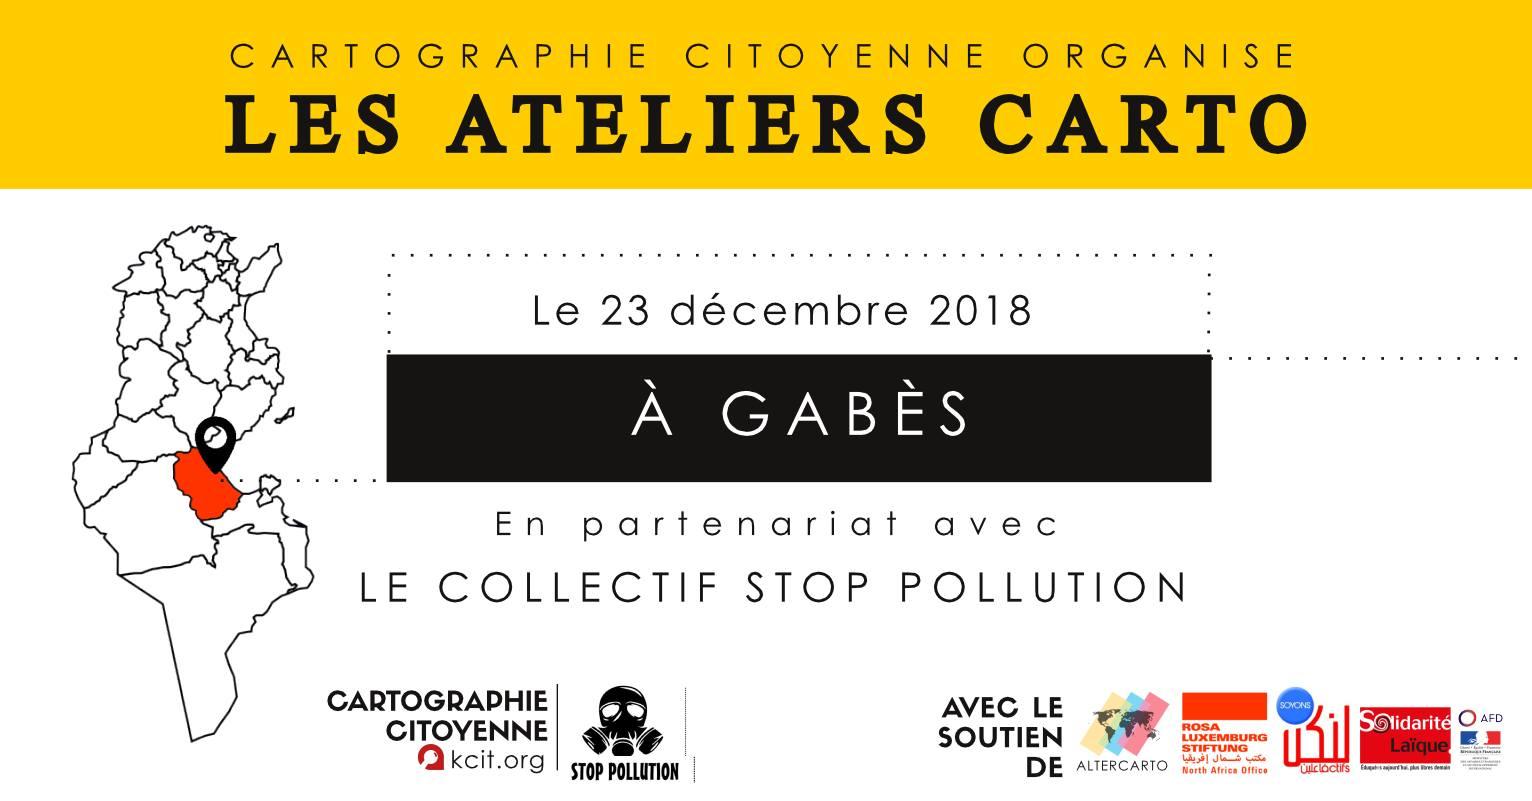 Les semaines CARTO : #8 à Gabès